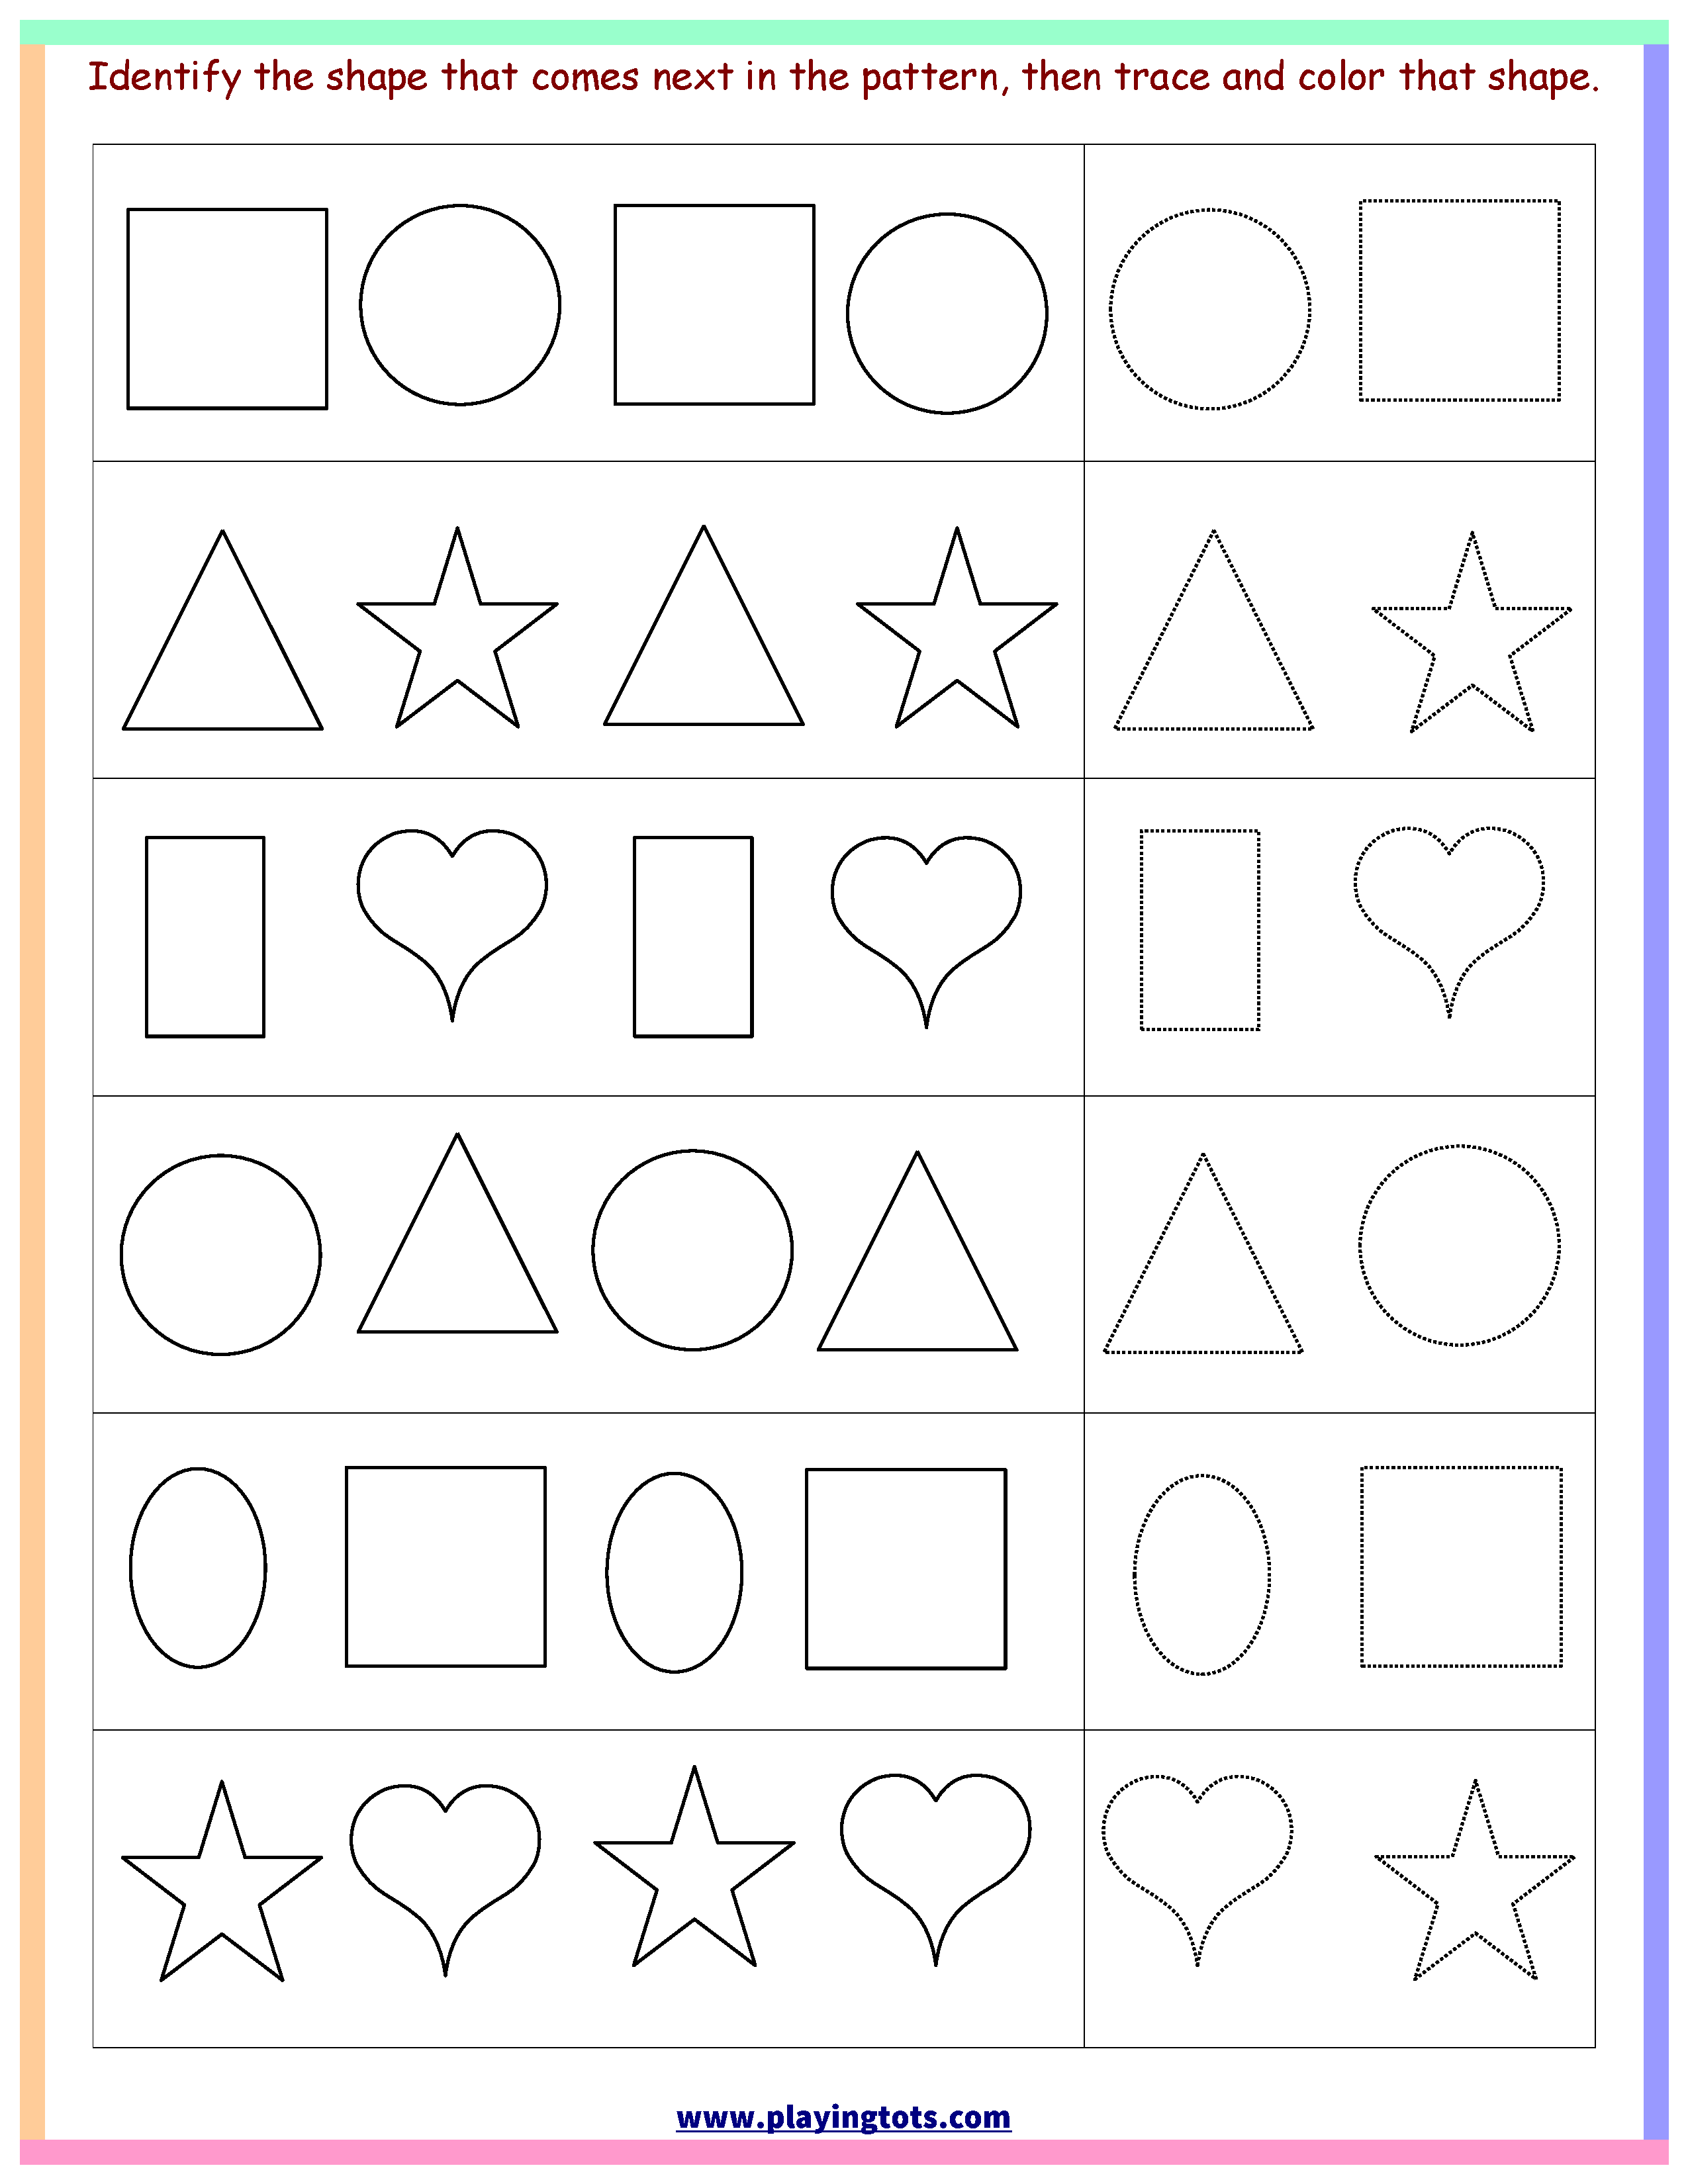 Worksheet,shapes,trace,color,pattern,free,printable,kids